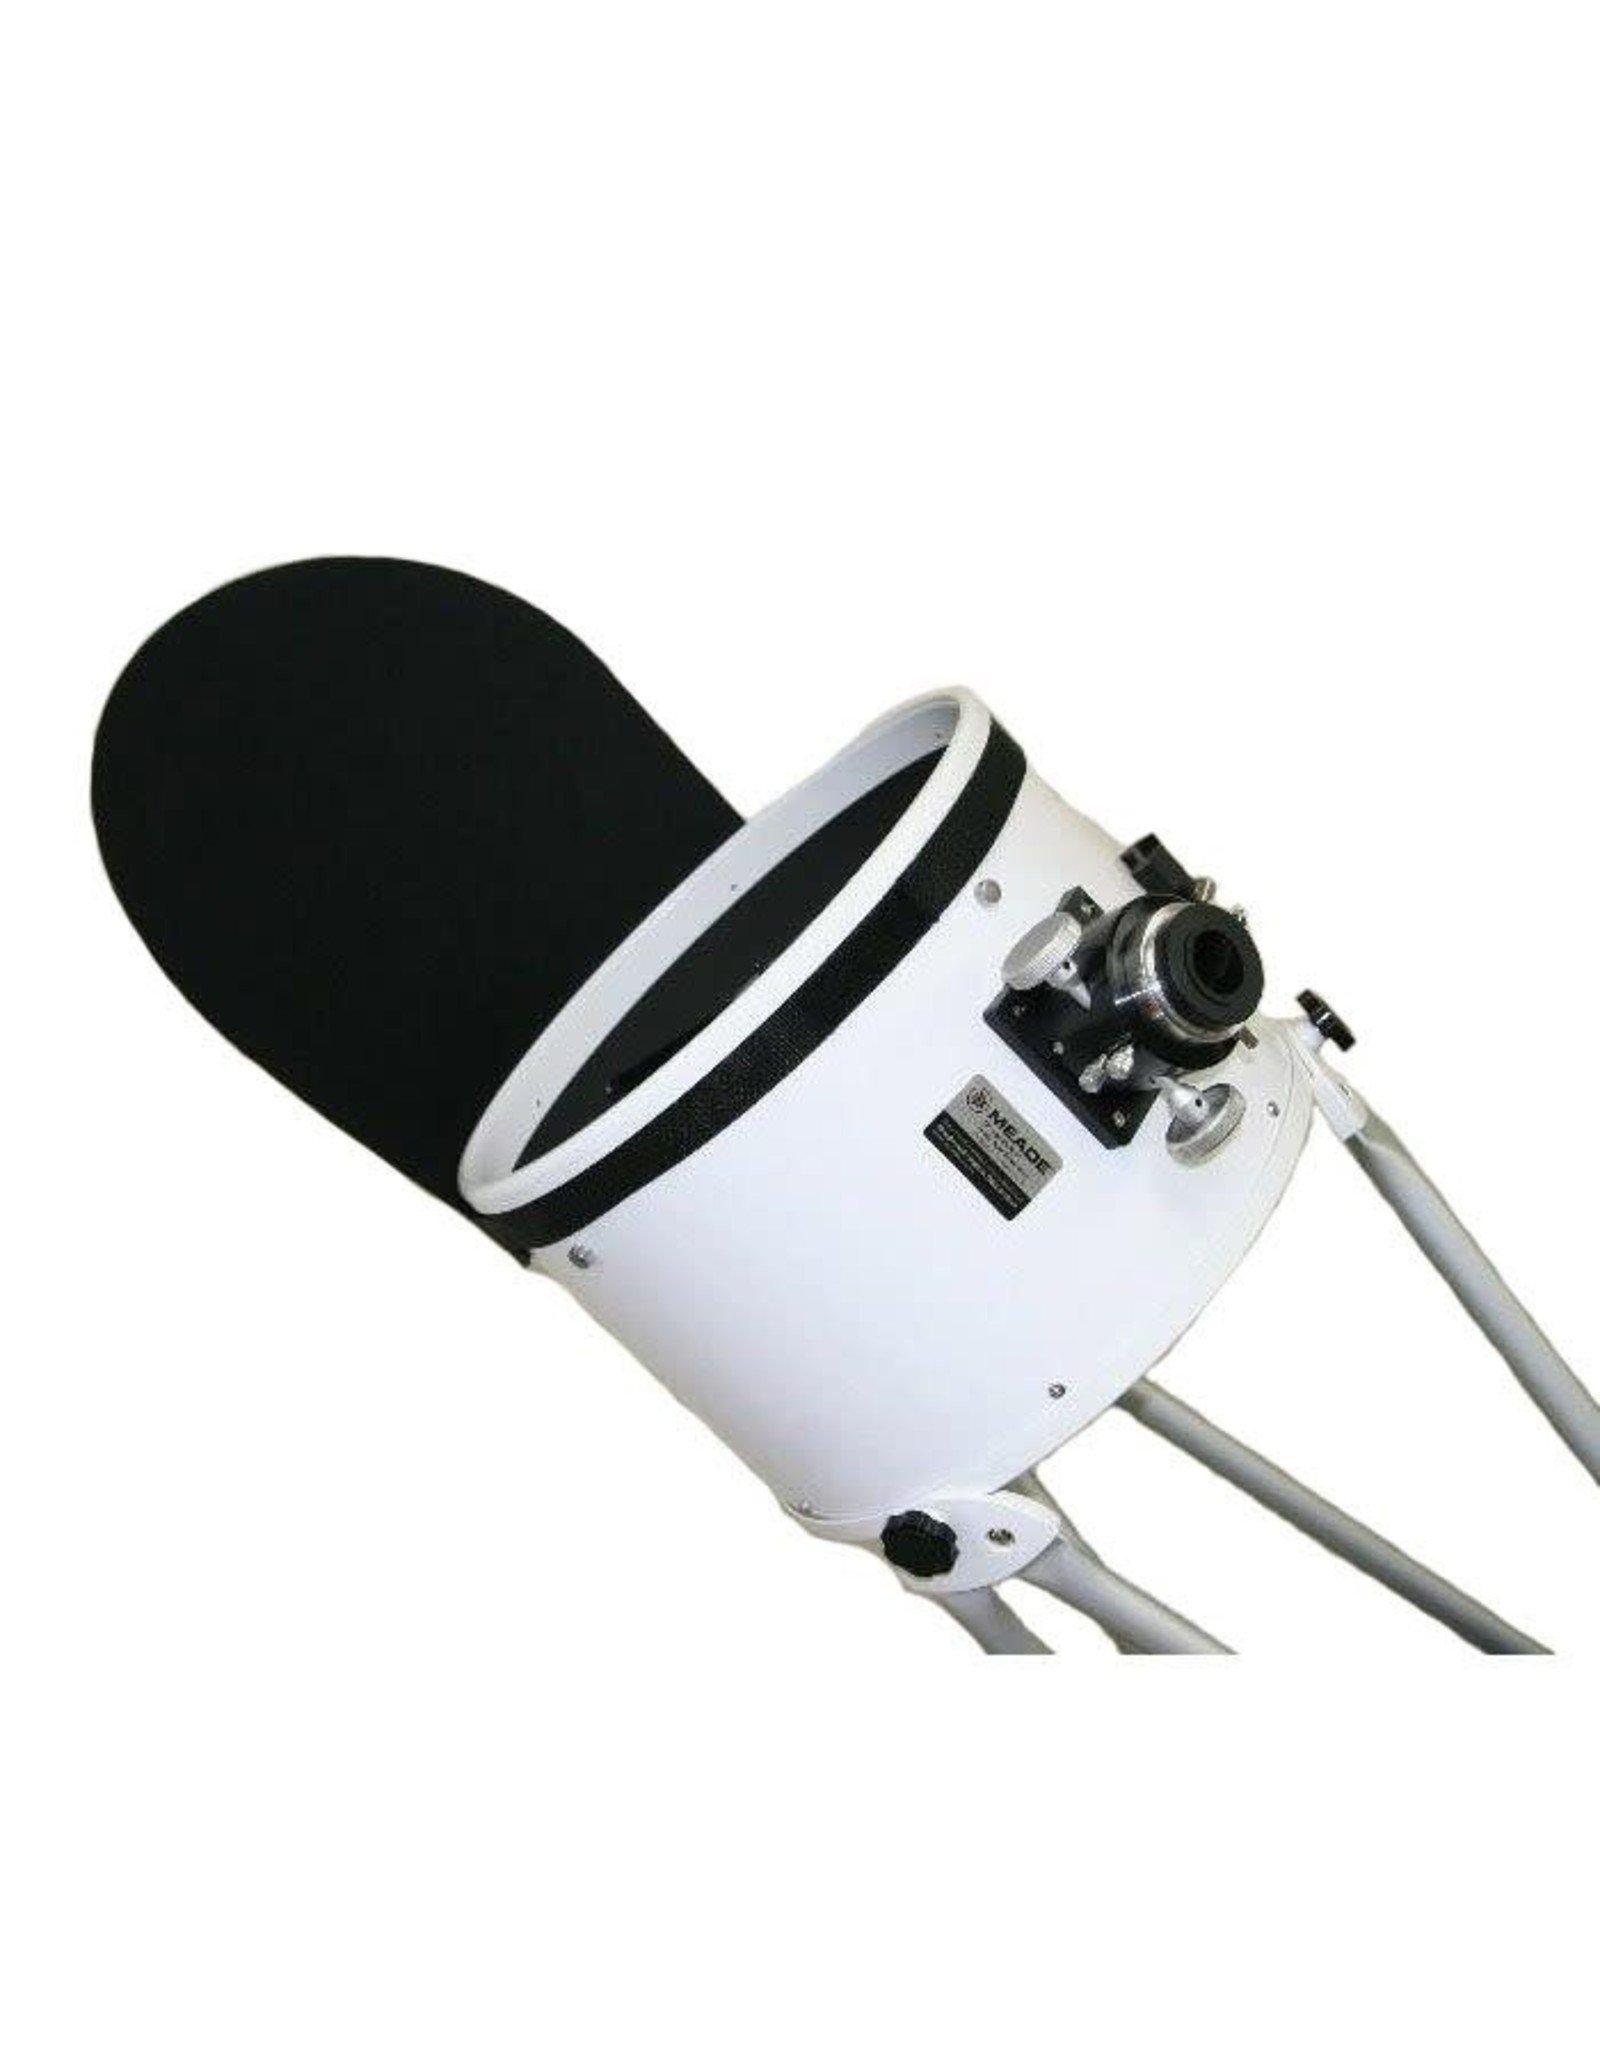 "Astrozap AstroZap Light Shield for 10"" Dobsonian Telescopes - AZ1202"